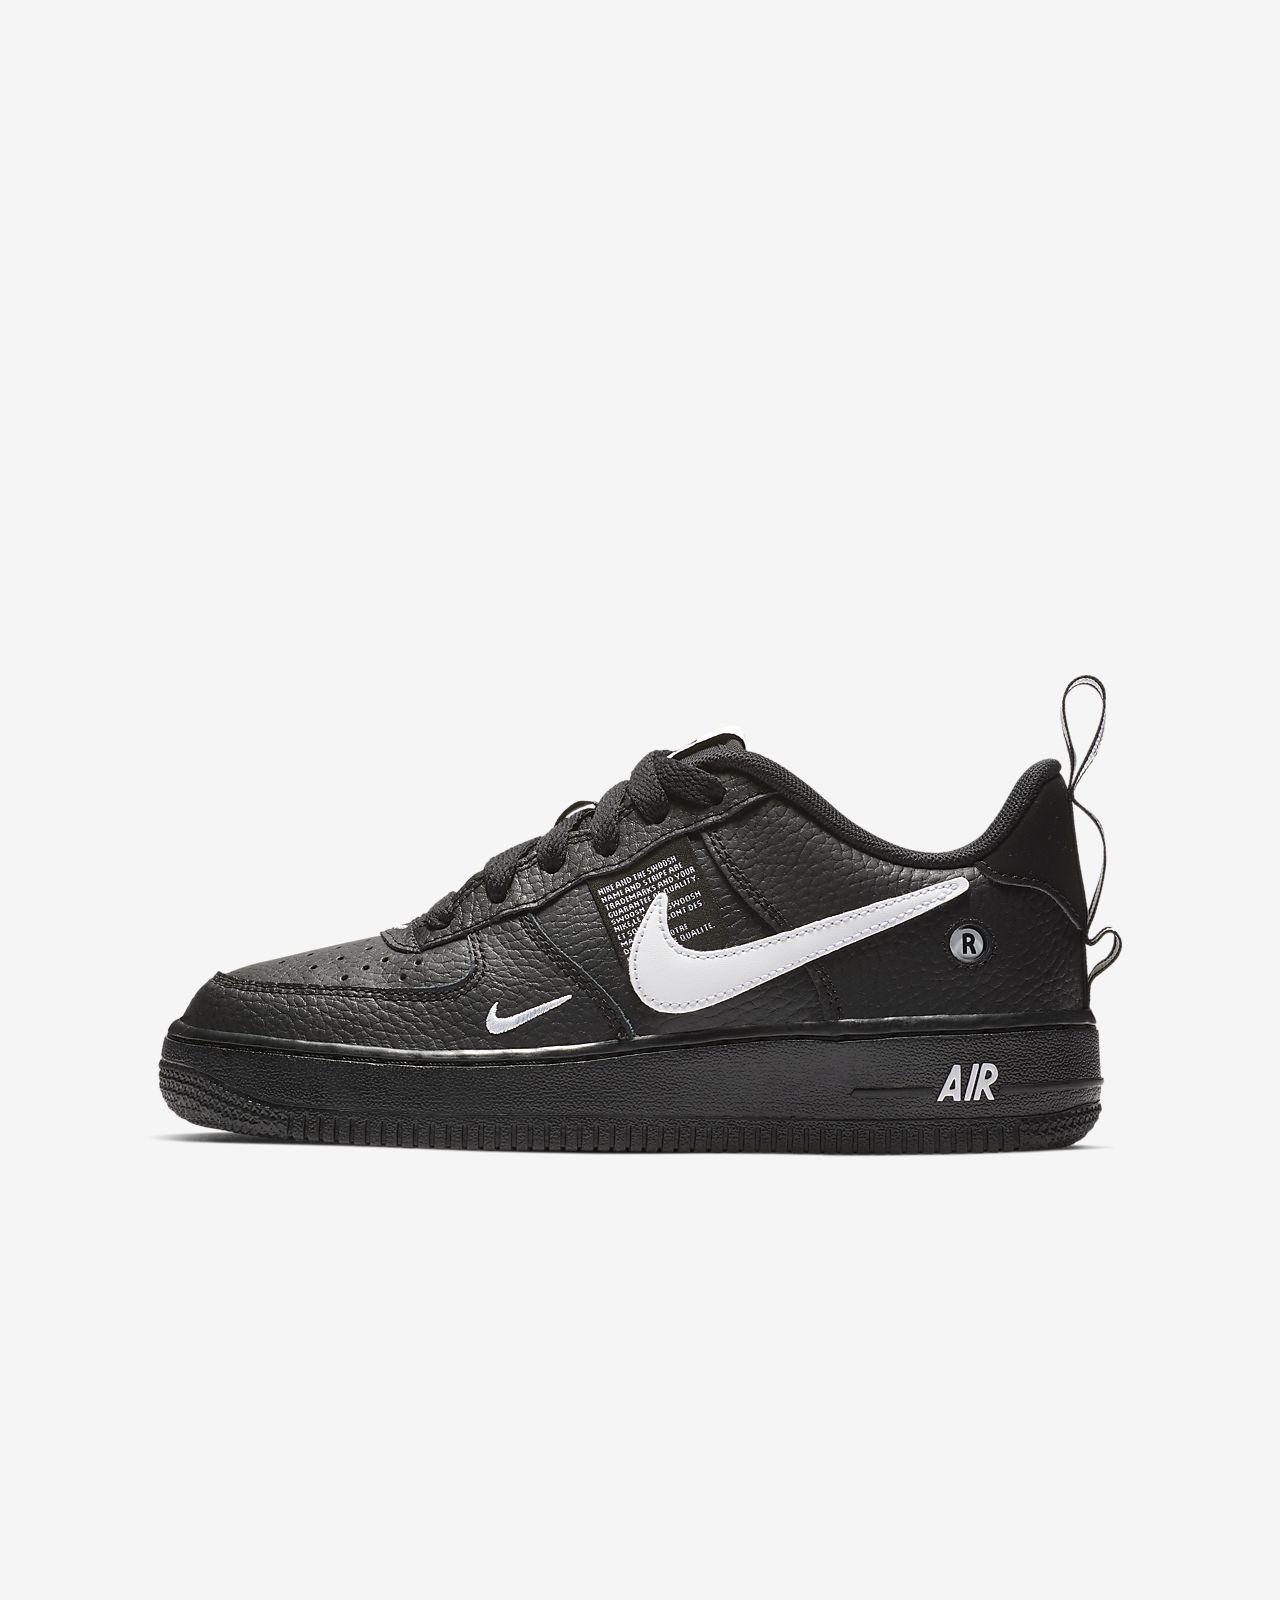 d5273b8d6693 Nike Air Force 1 LV8 Utility Big Kids  Shoe. Nike.com